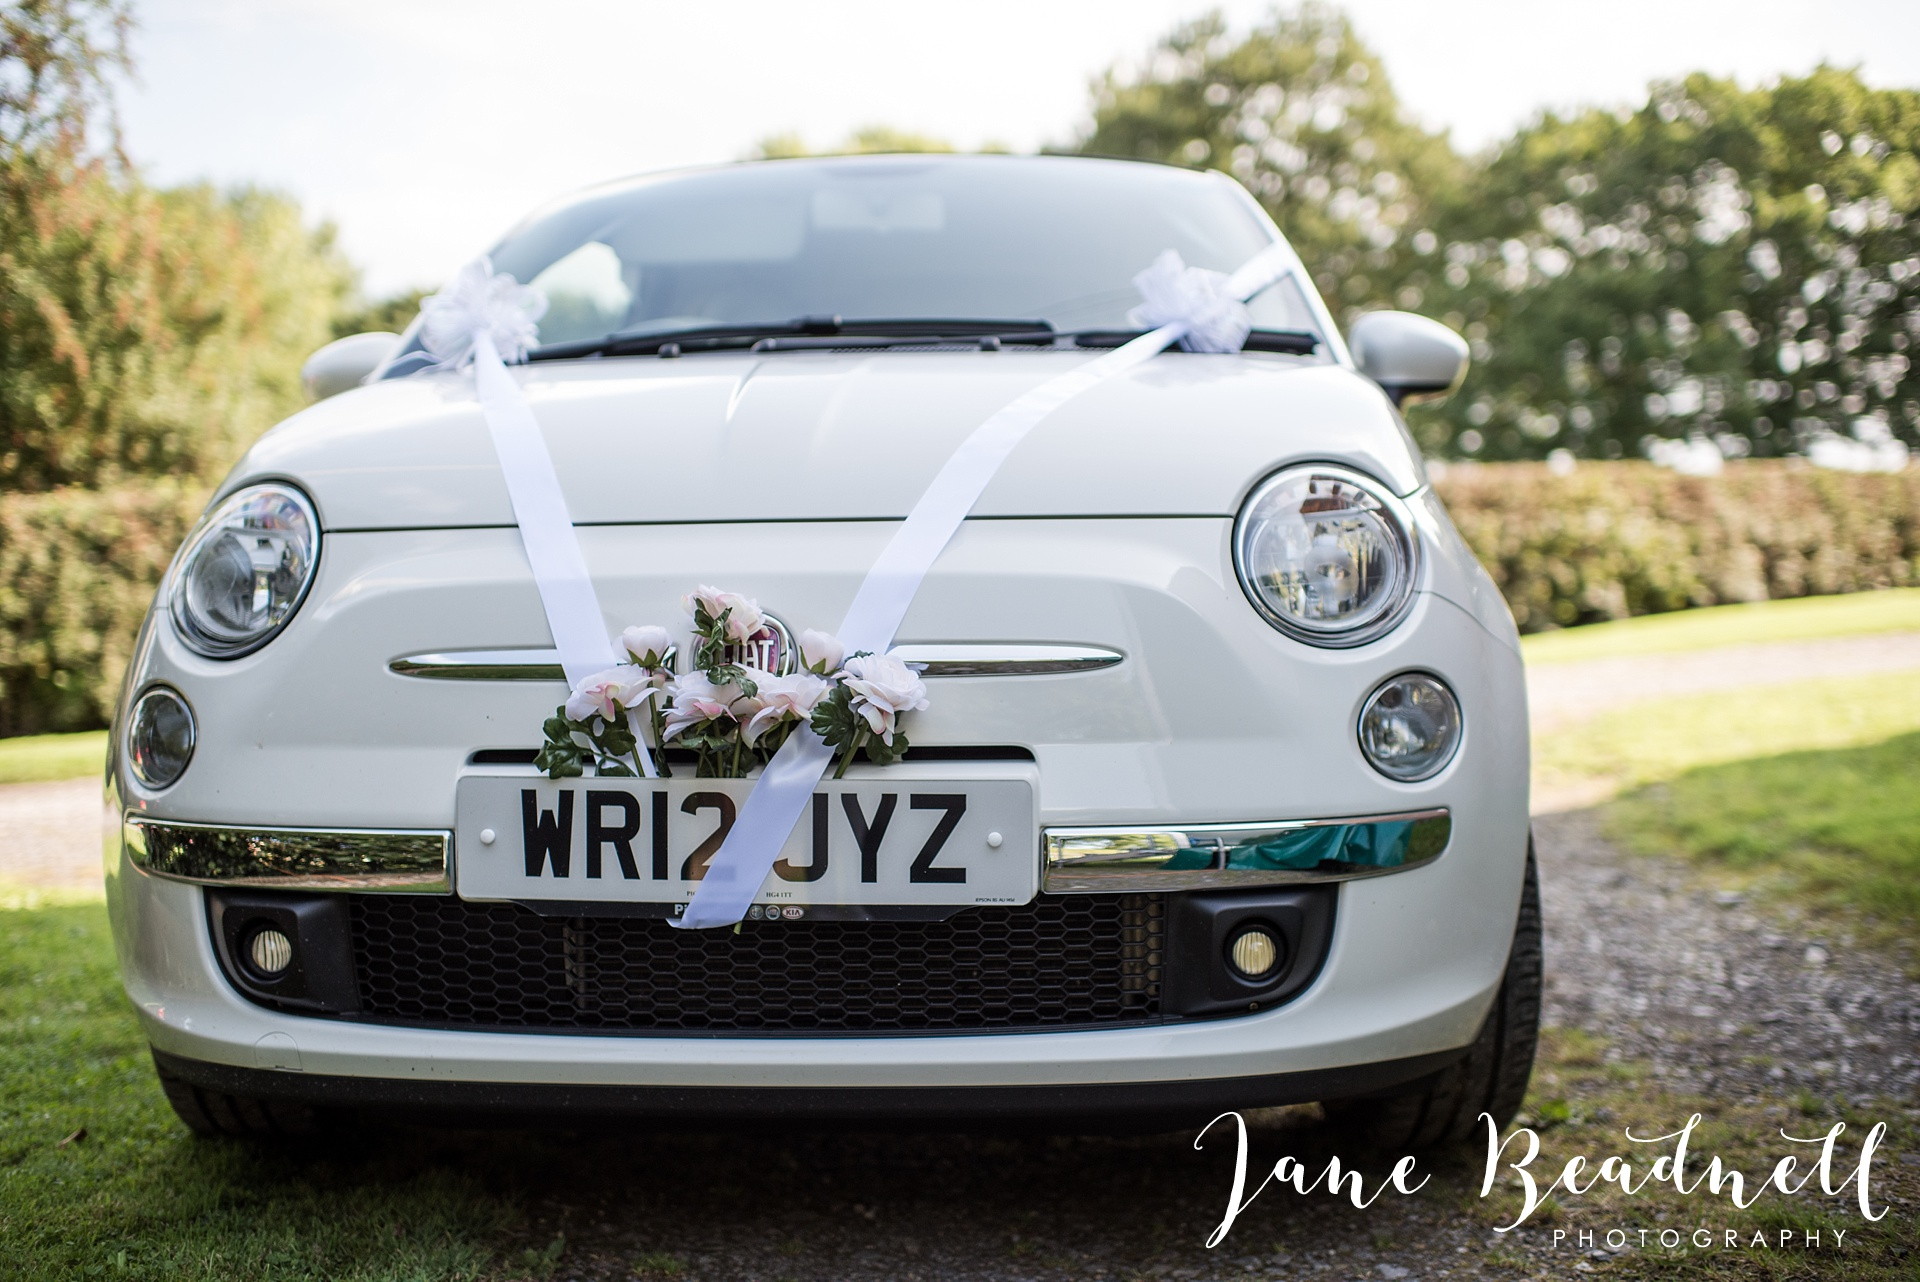 fine-art-wedding-photographer-jane-beadnell-yorkshire-wedding-photographer_0030